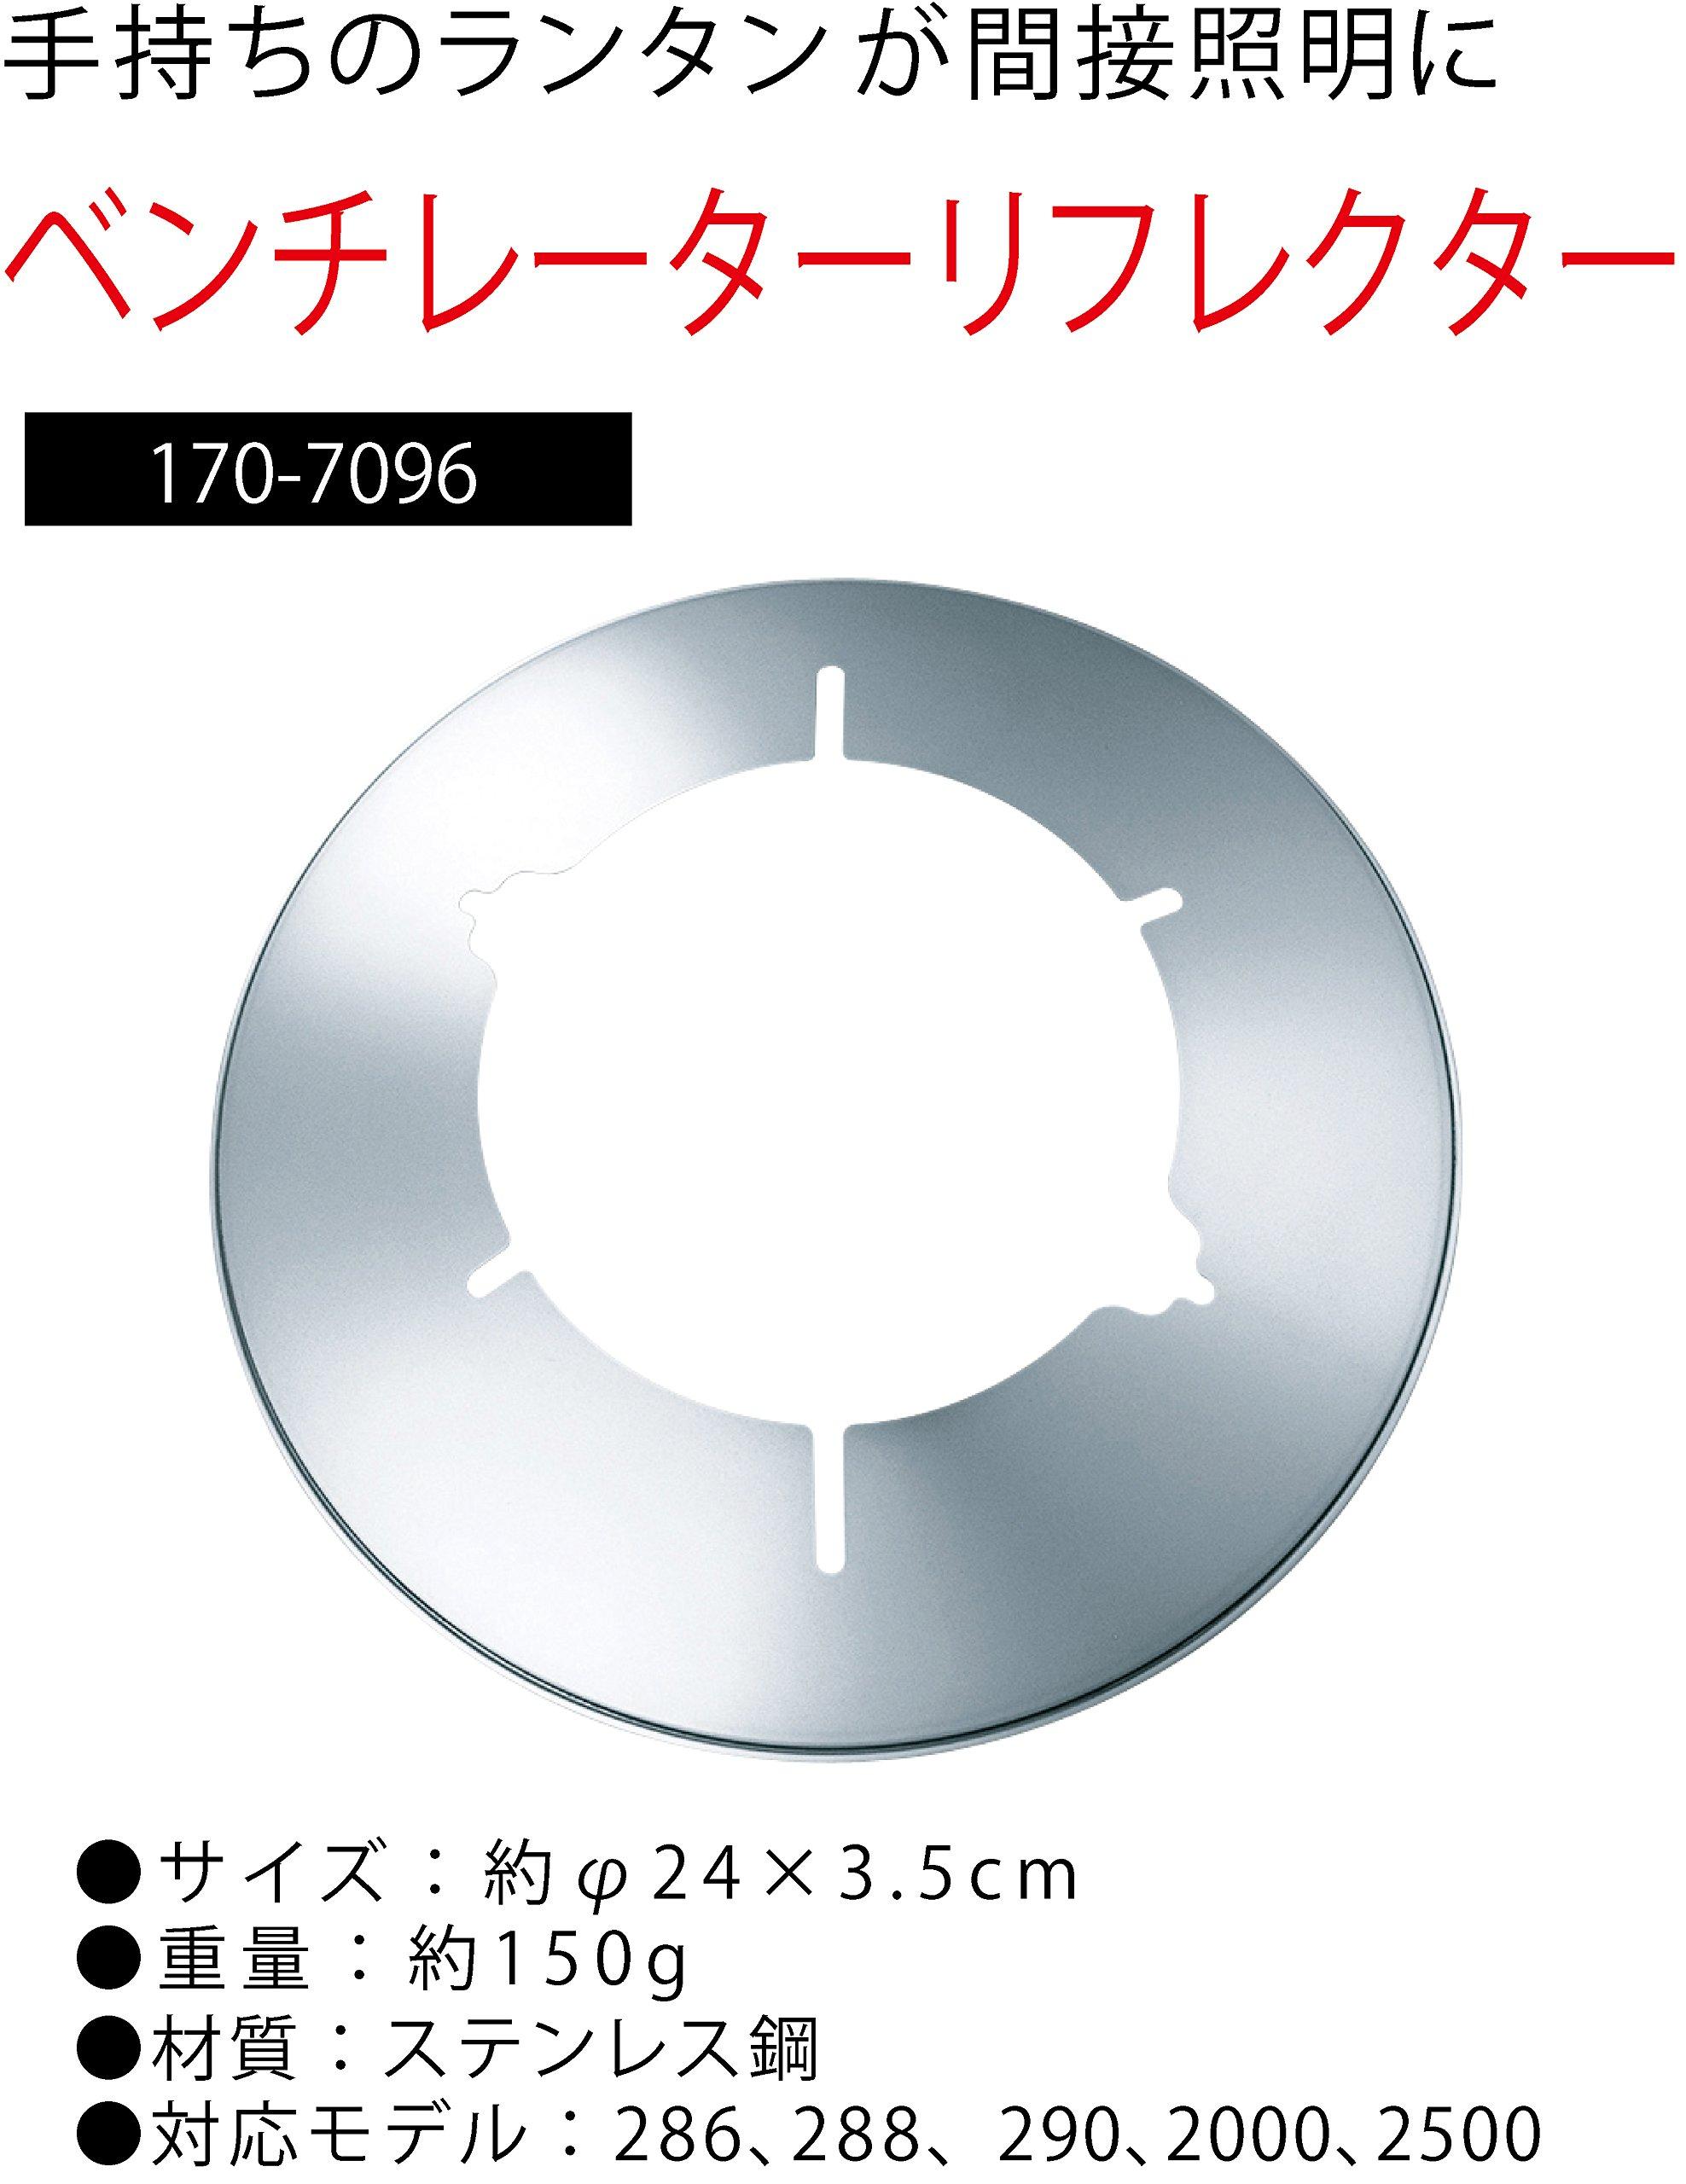 Coleman (Coleman) ventilator reflector 170-7096